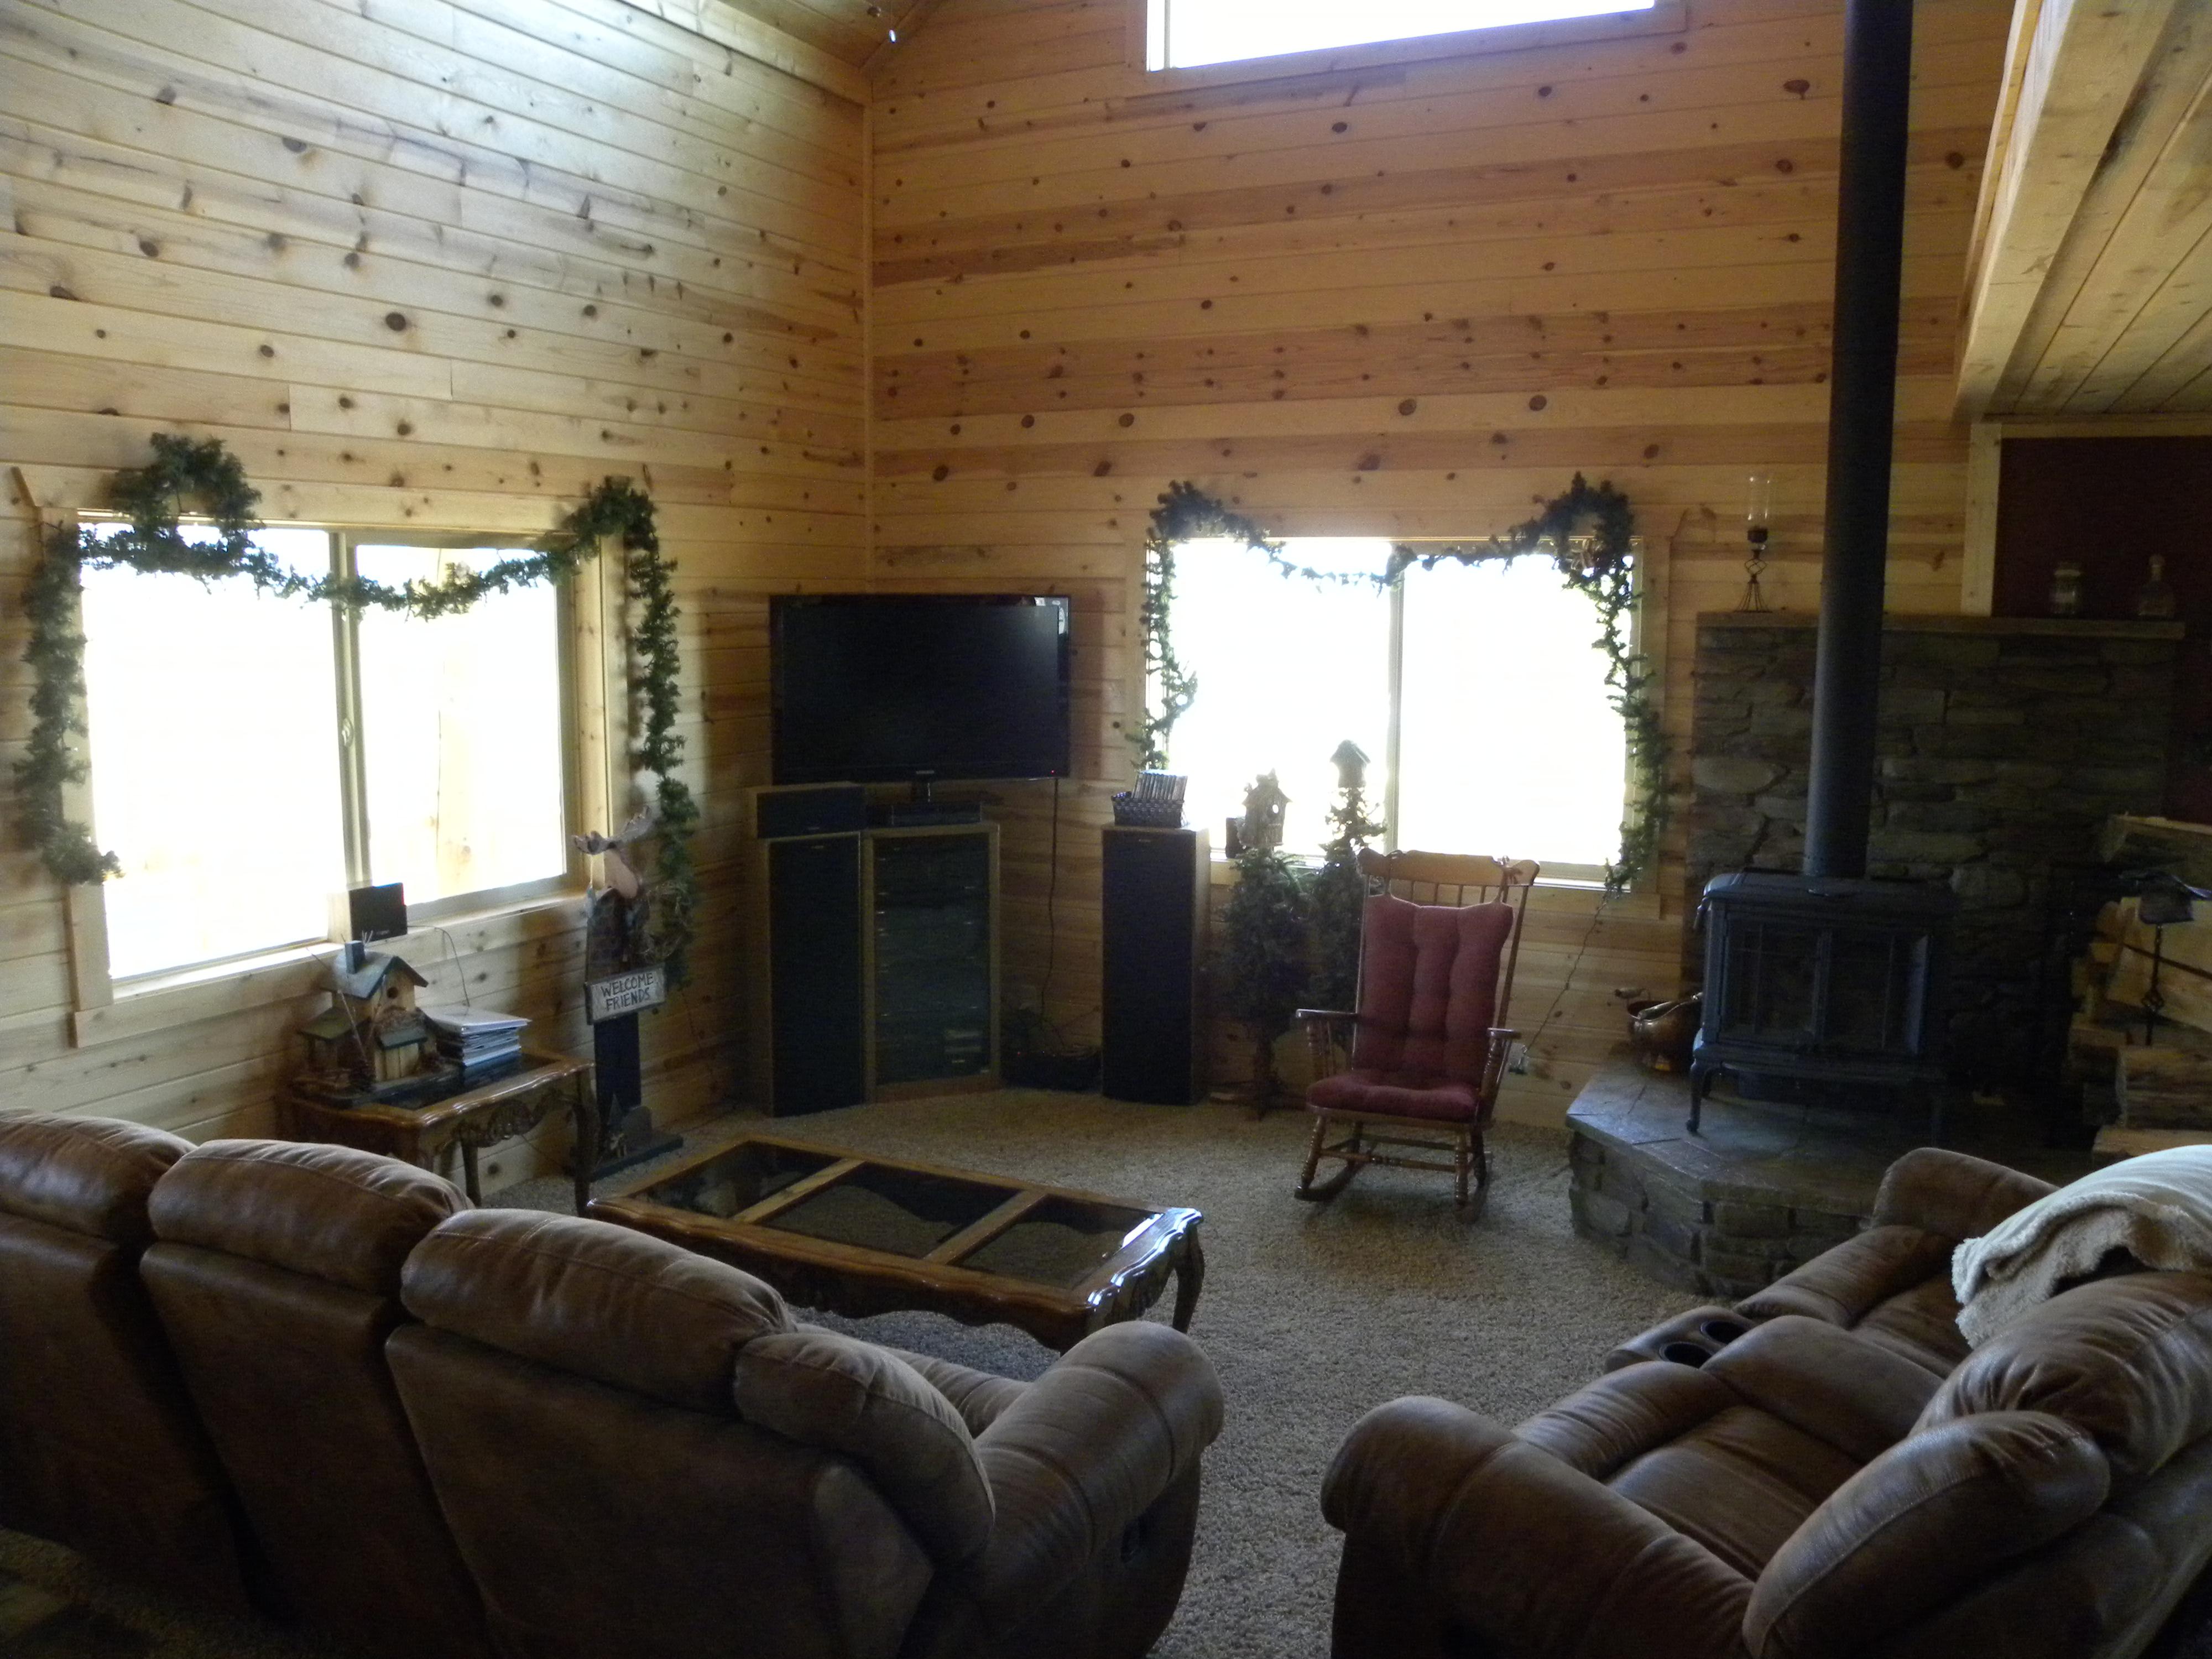 idaho big cabin photo in rentals lodge x island cabins att yellowstone springs marvelous gallery park of